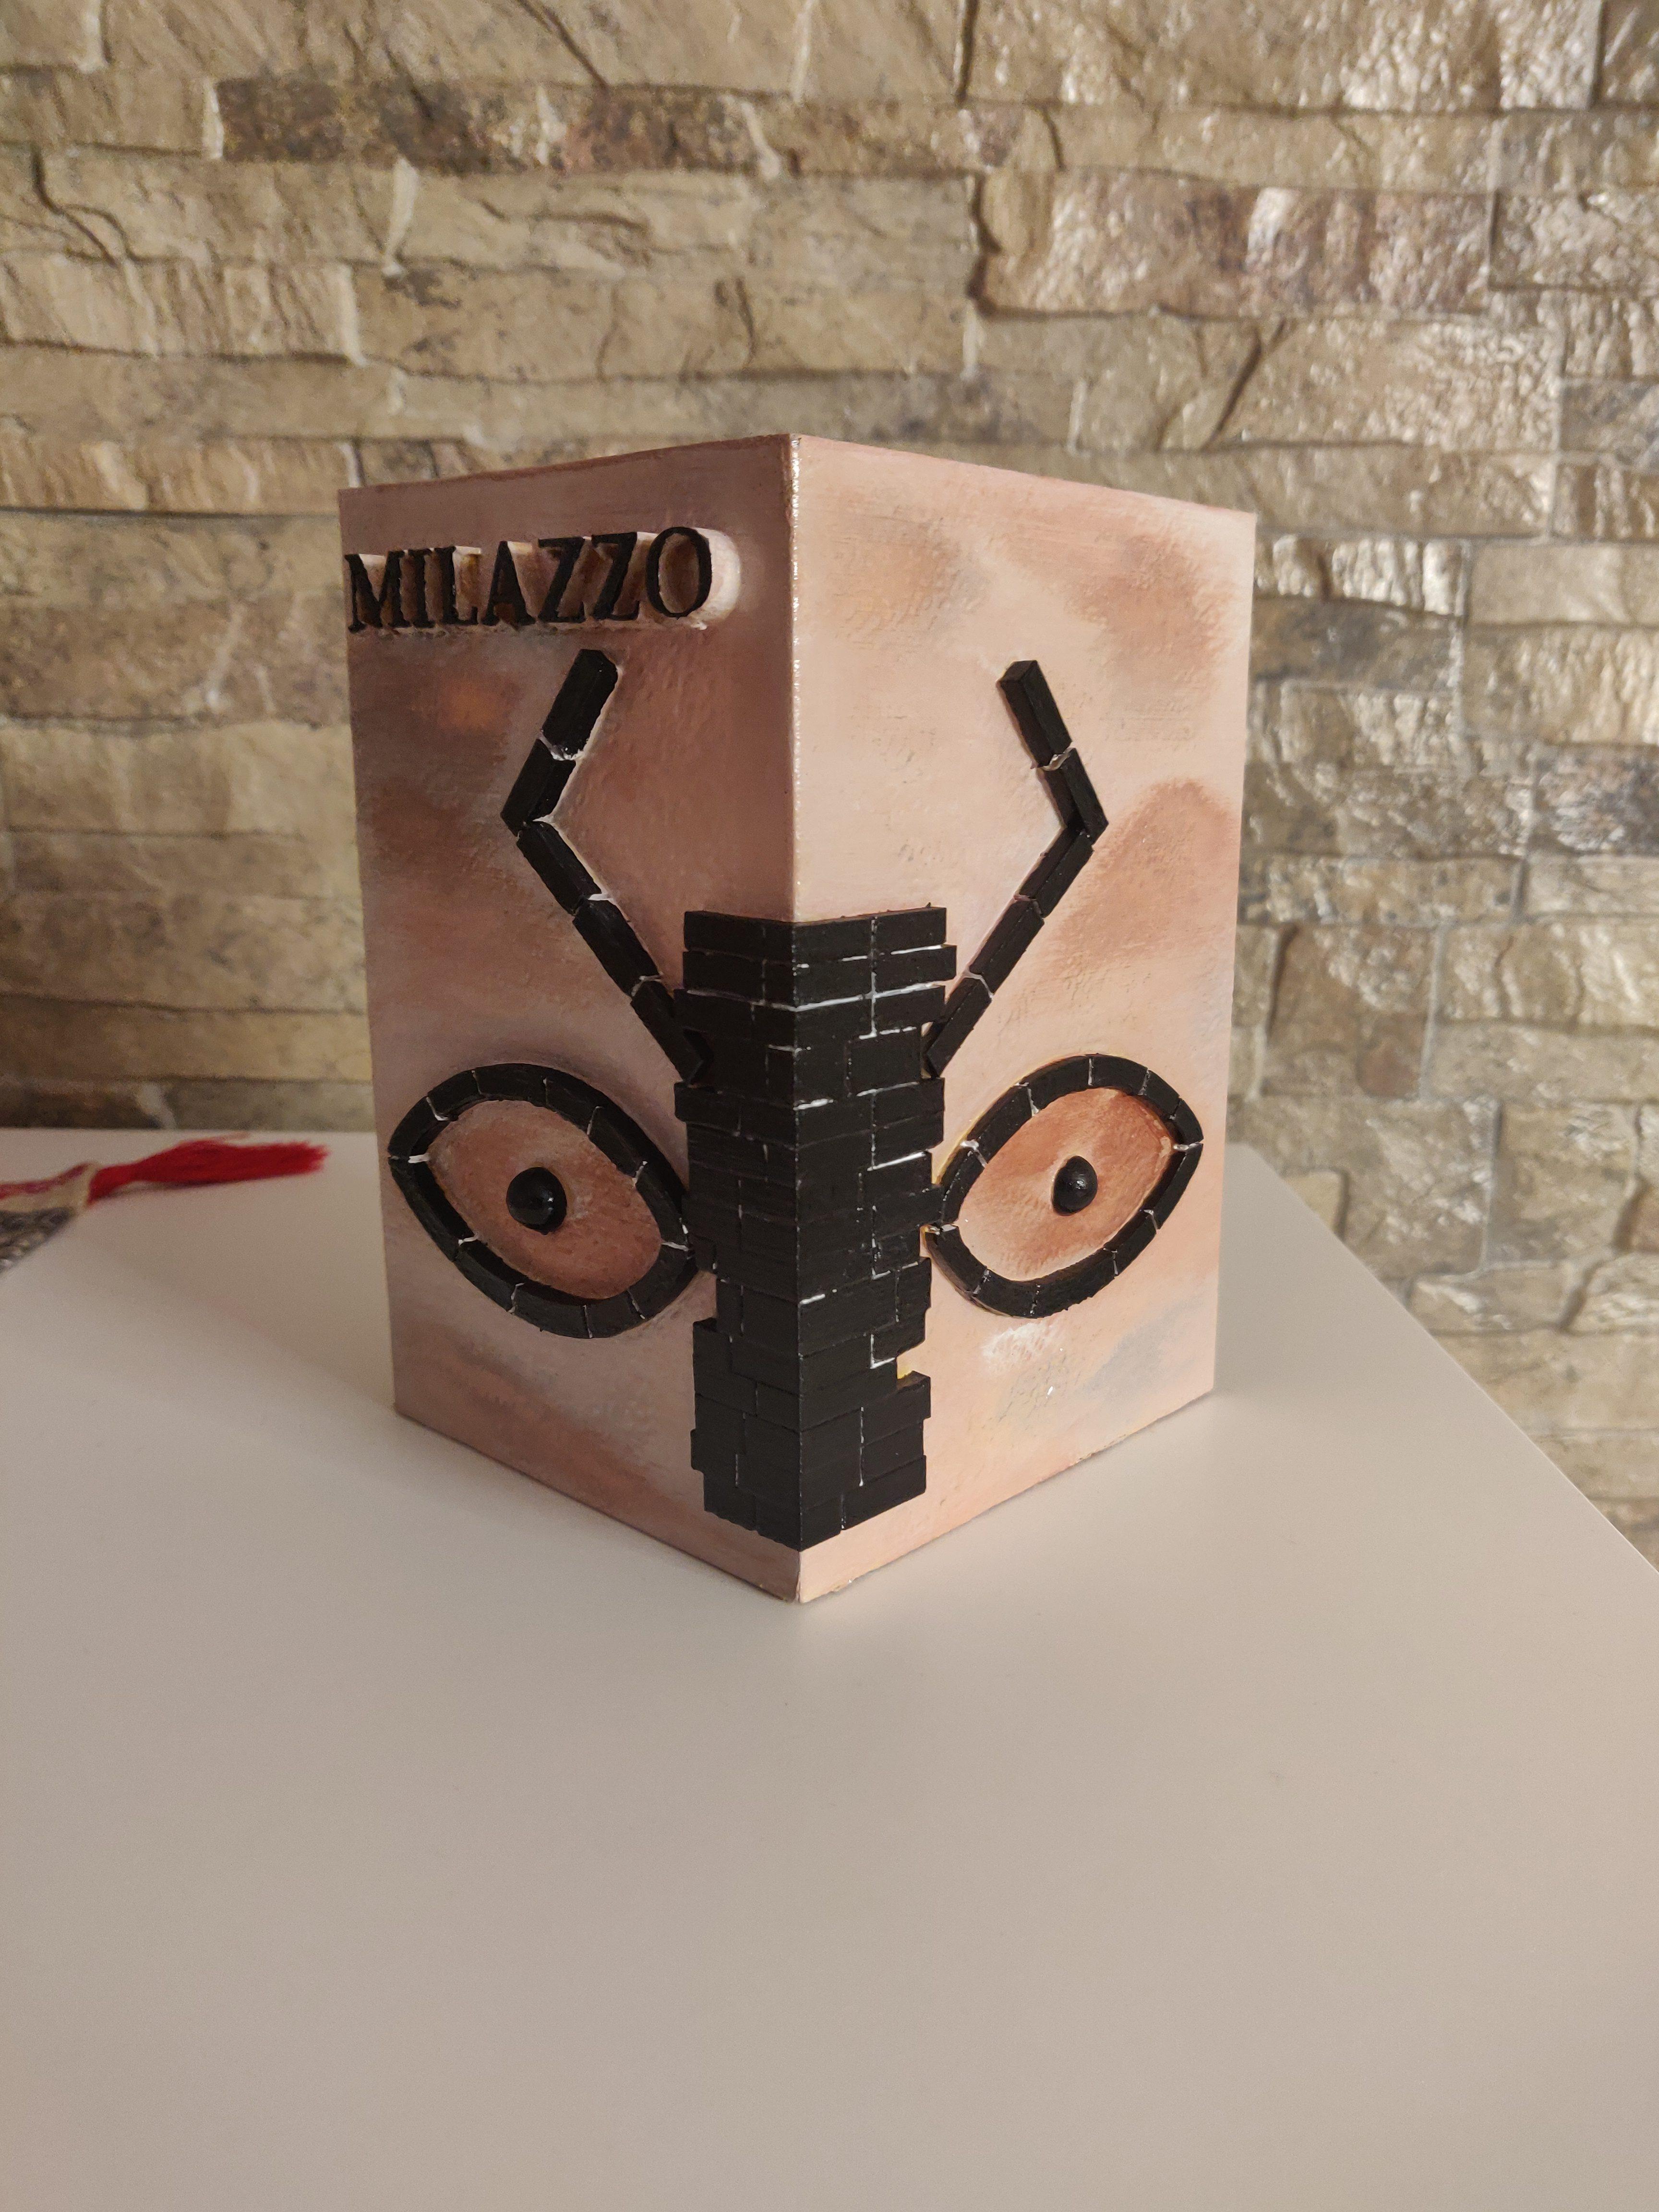 LO SCARABEO DI MILAZZO IN 3D